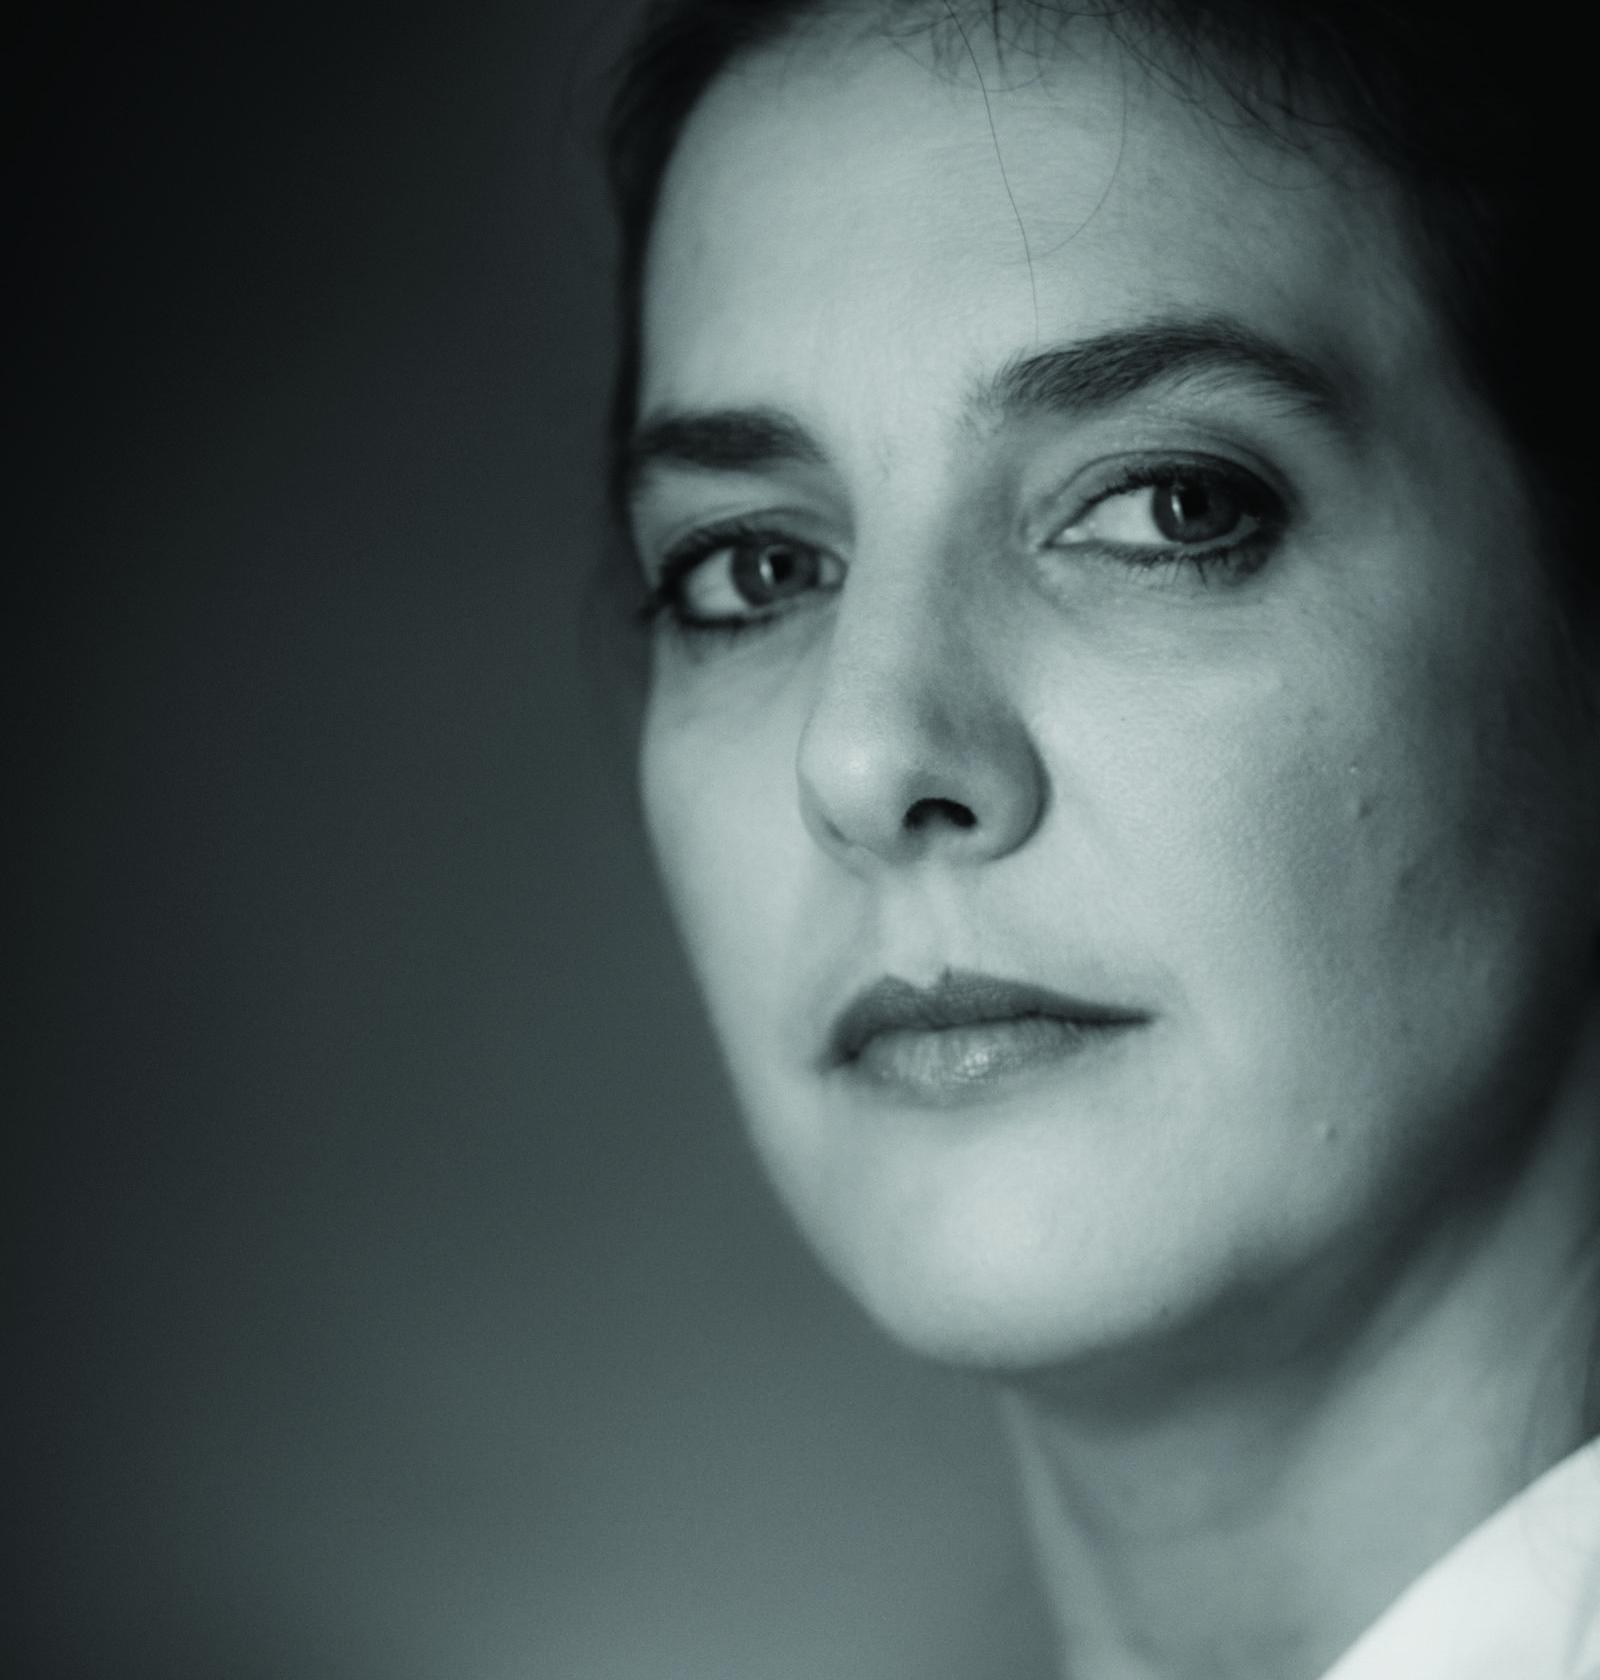 Isabelle Corlier